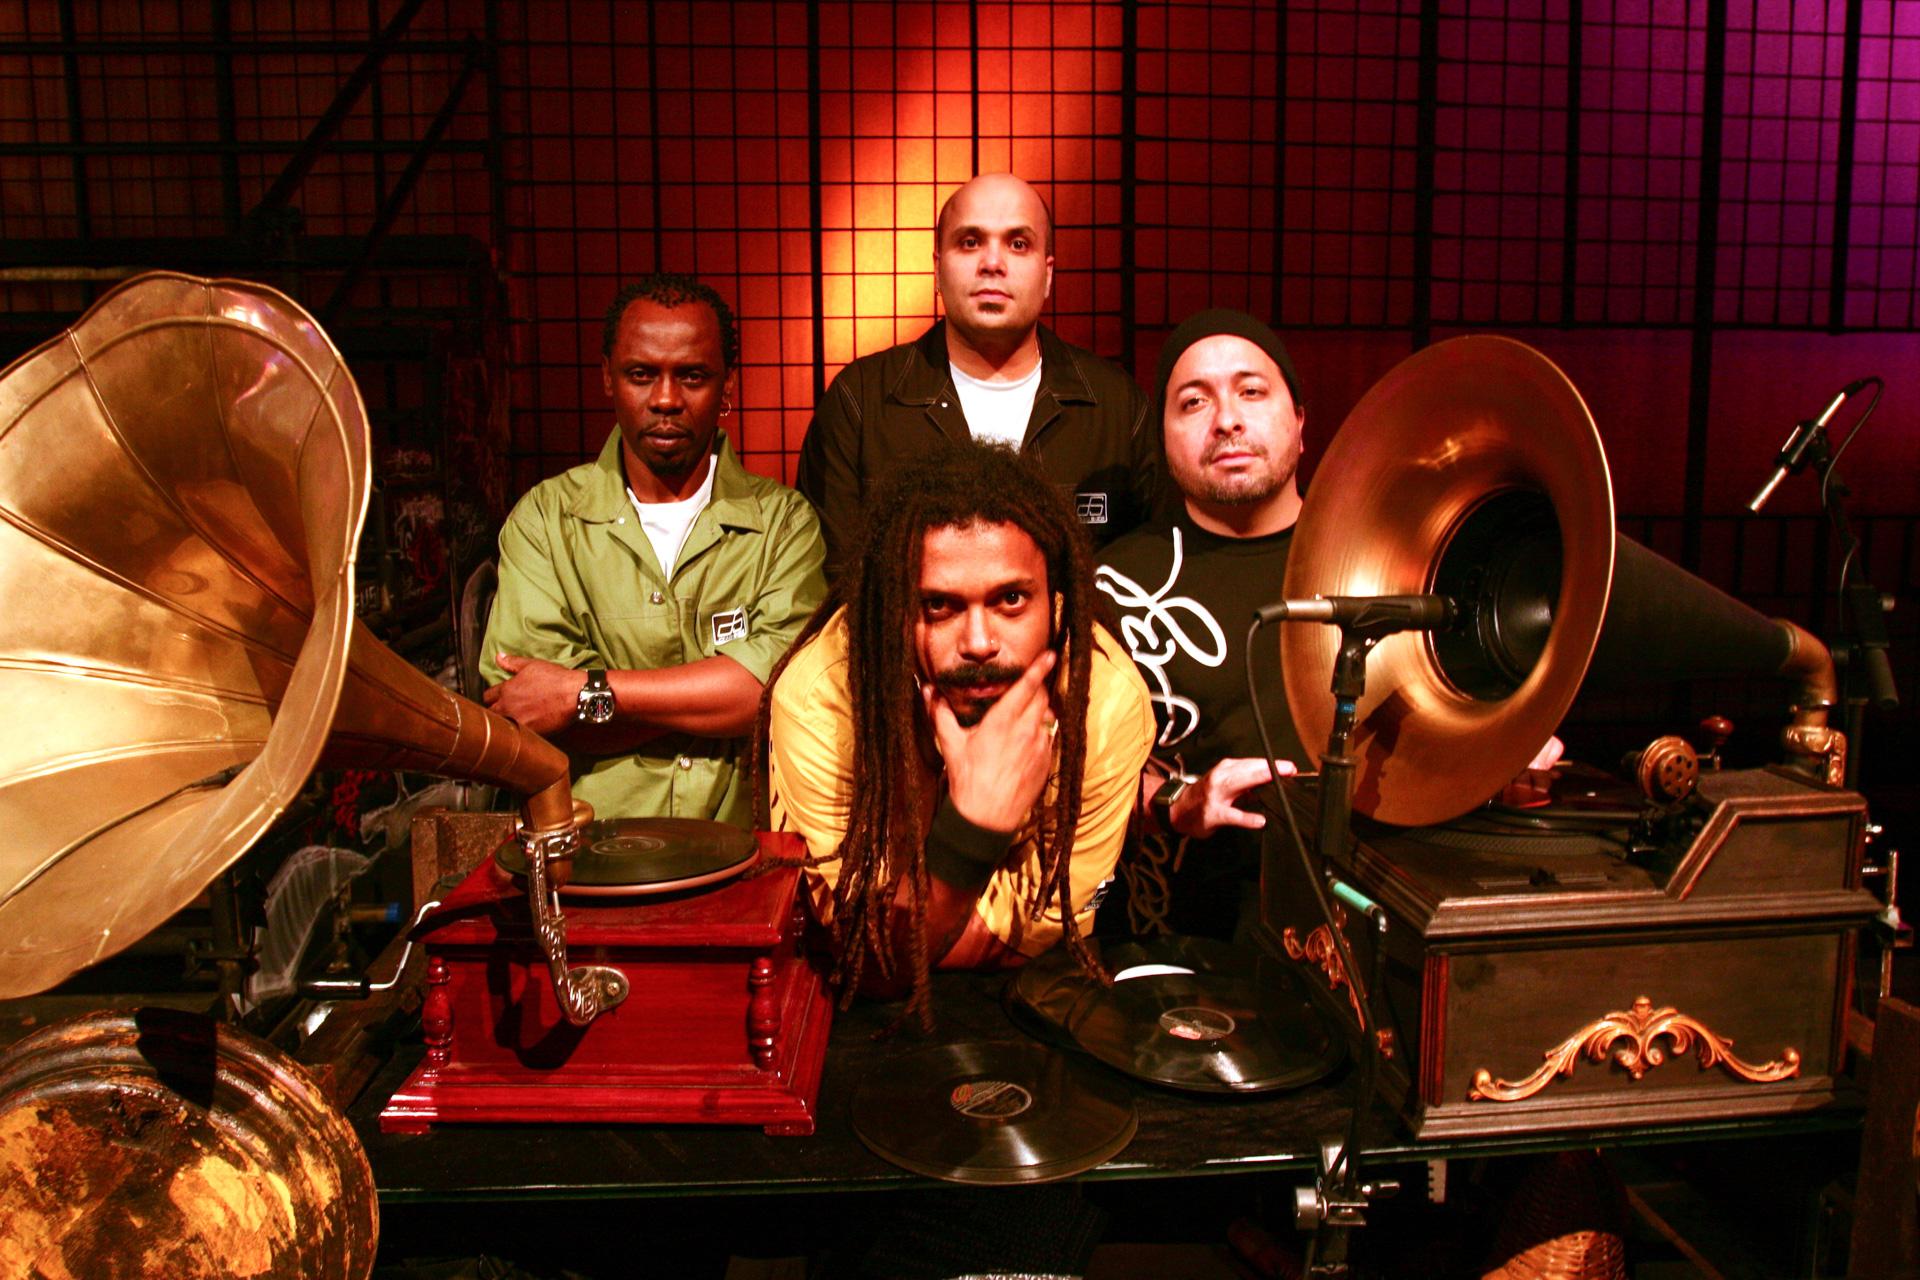 O Rappa _ Unplugged MTV promo